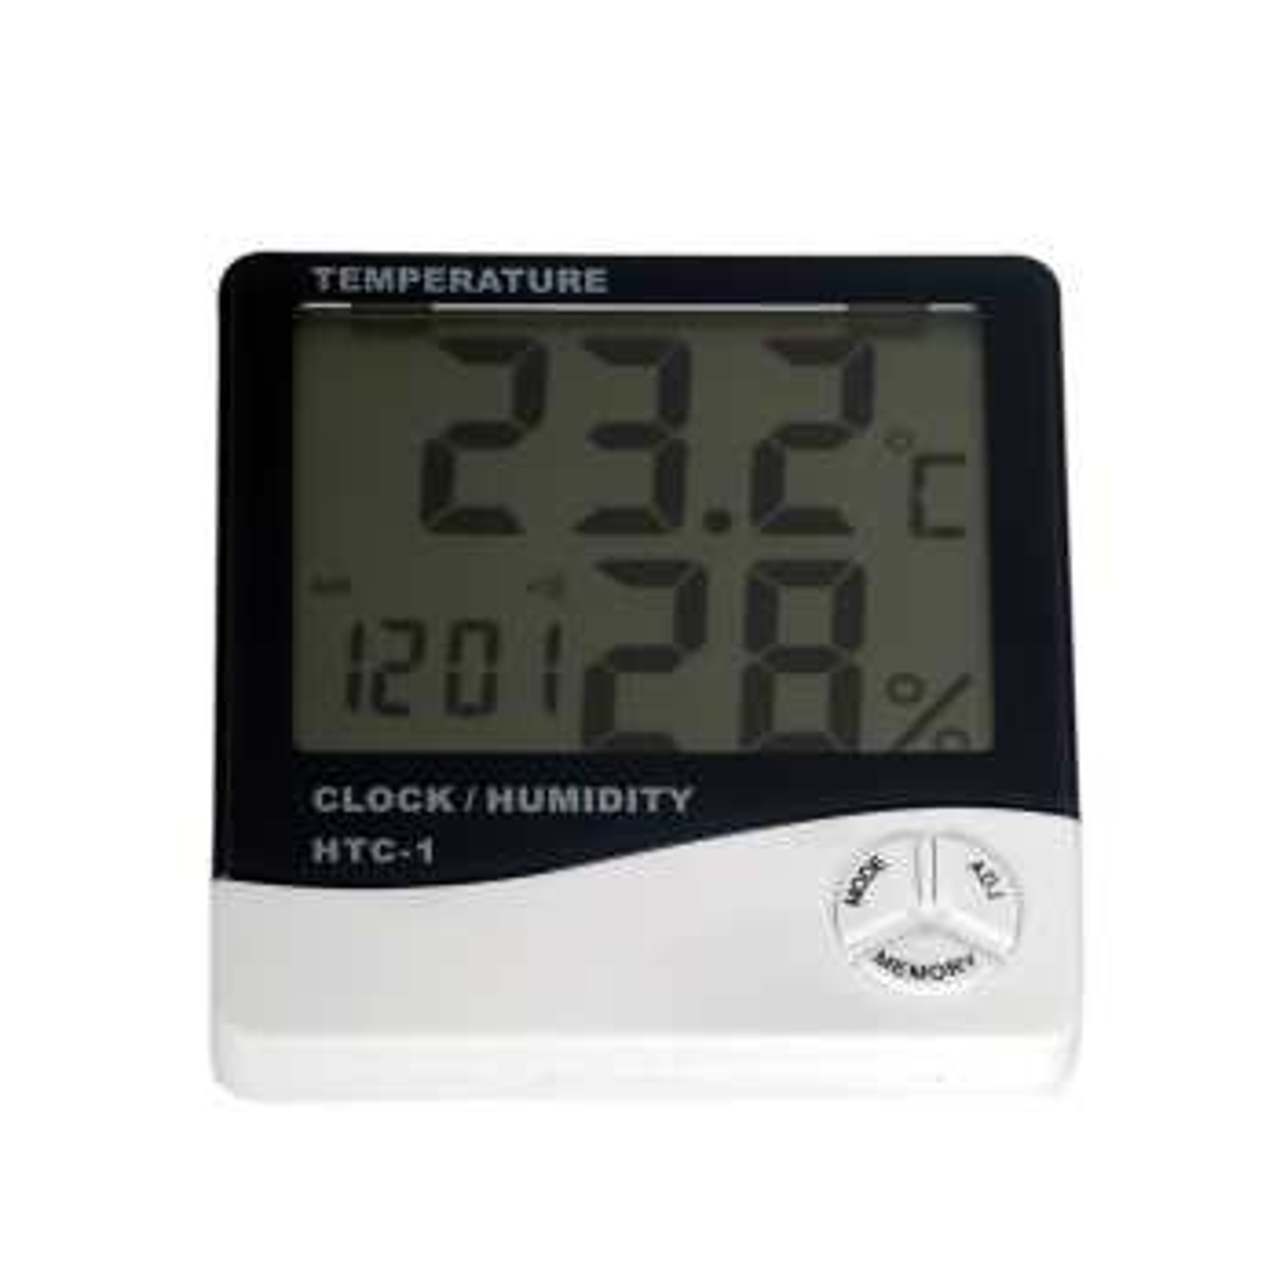 دماسنج و رطوبت سنج HTC-1 | Thermo-Humidity Meter HTC-1